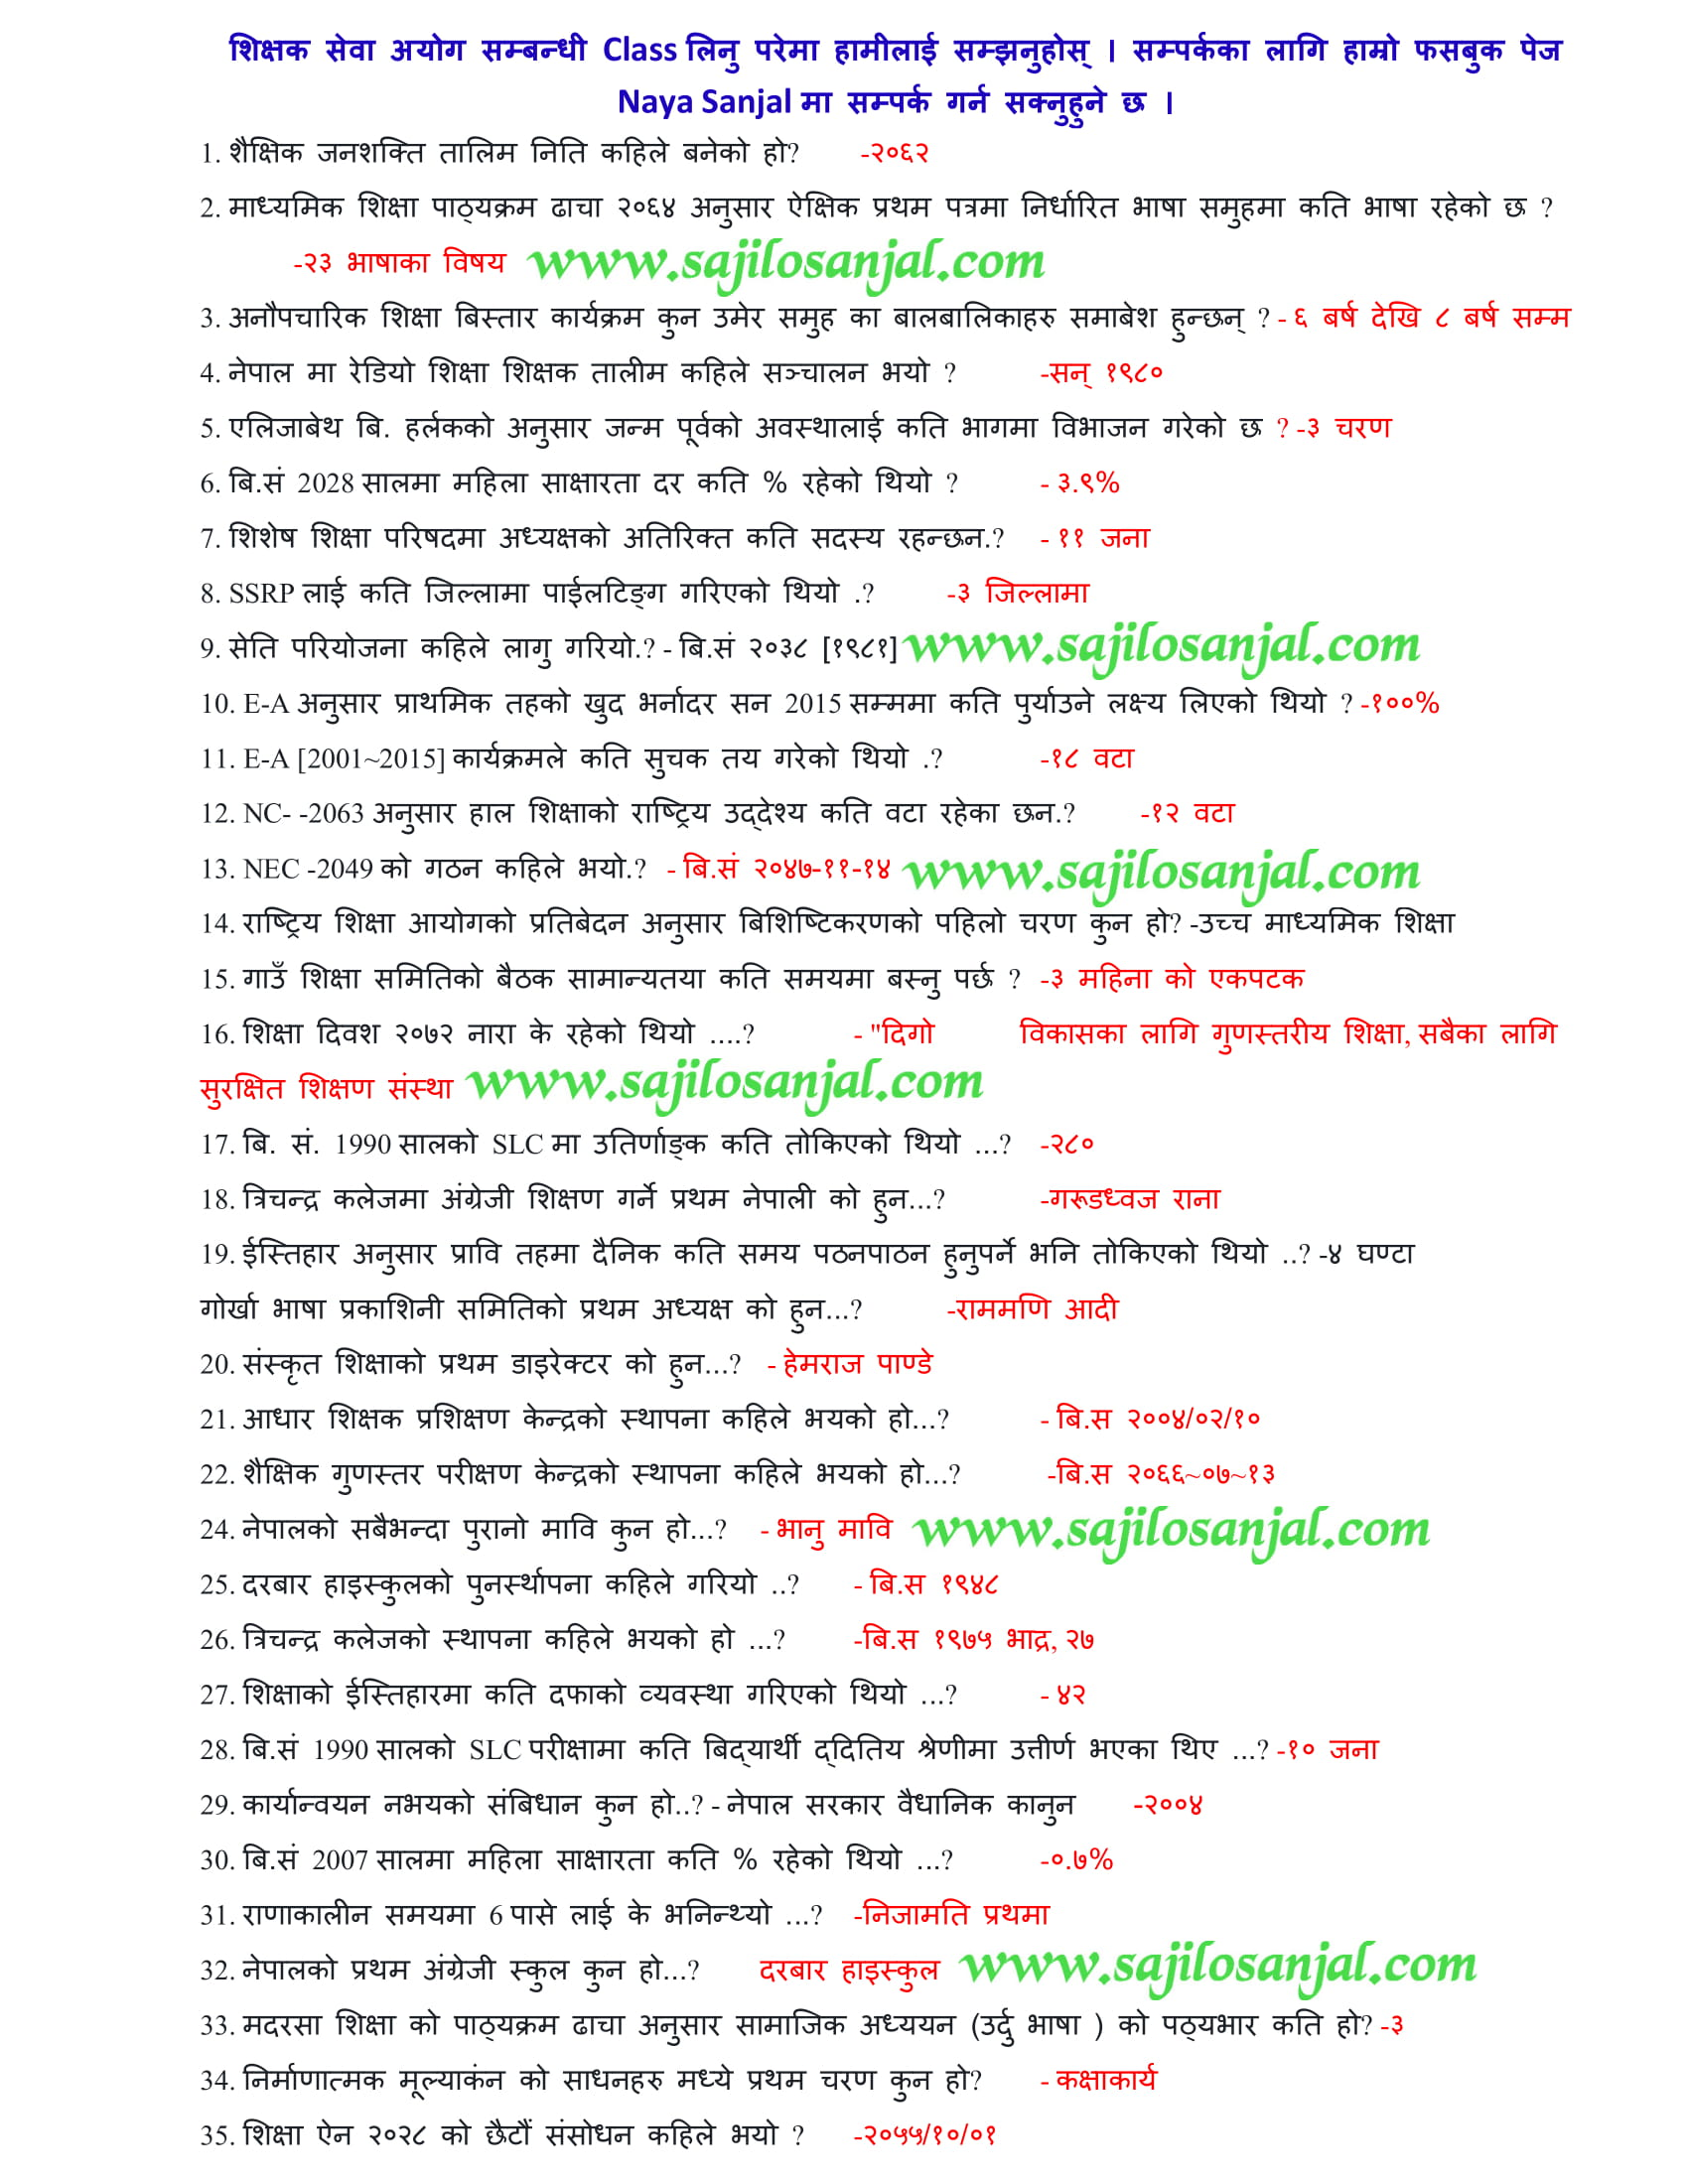 Secondary Level TSC Nepal Exam Questionssecondary level TSC questionsTSC Nepal ma vi questionstsc nepal model questionsTSC Nepal questions